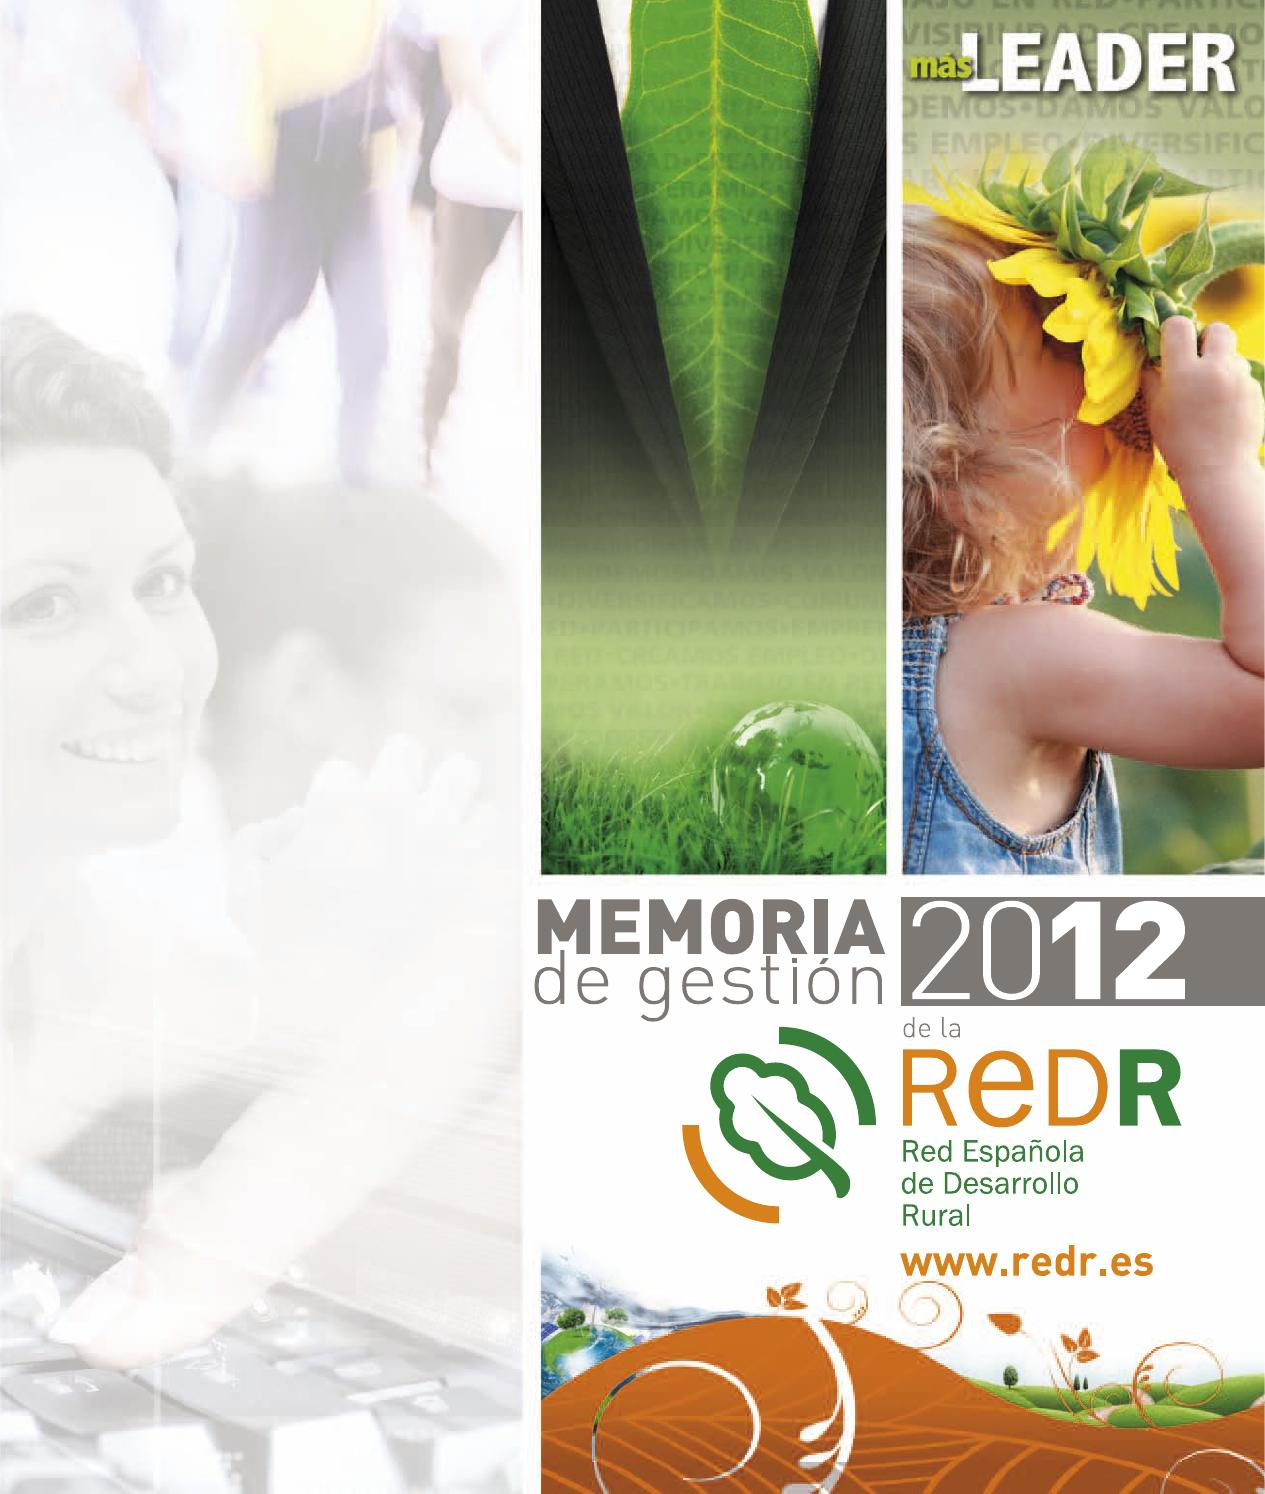 Calendario Escolar 2020 16 Cantabria.Memoria De Gestion De La Redr 2012